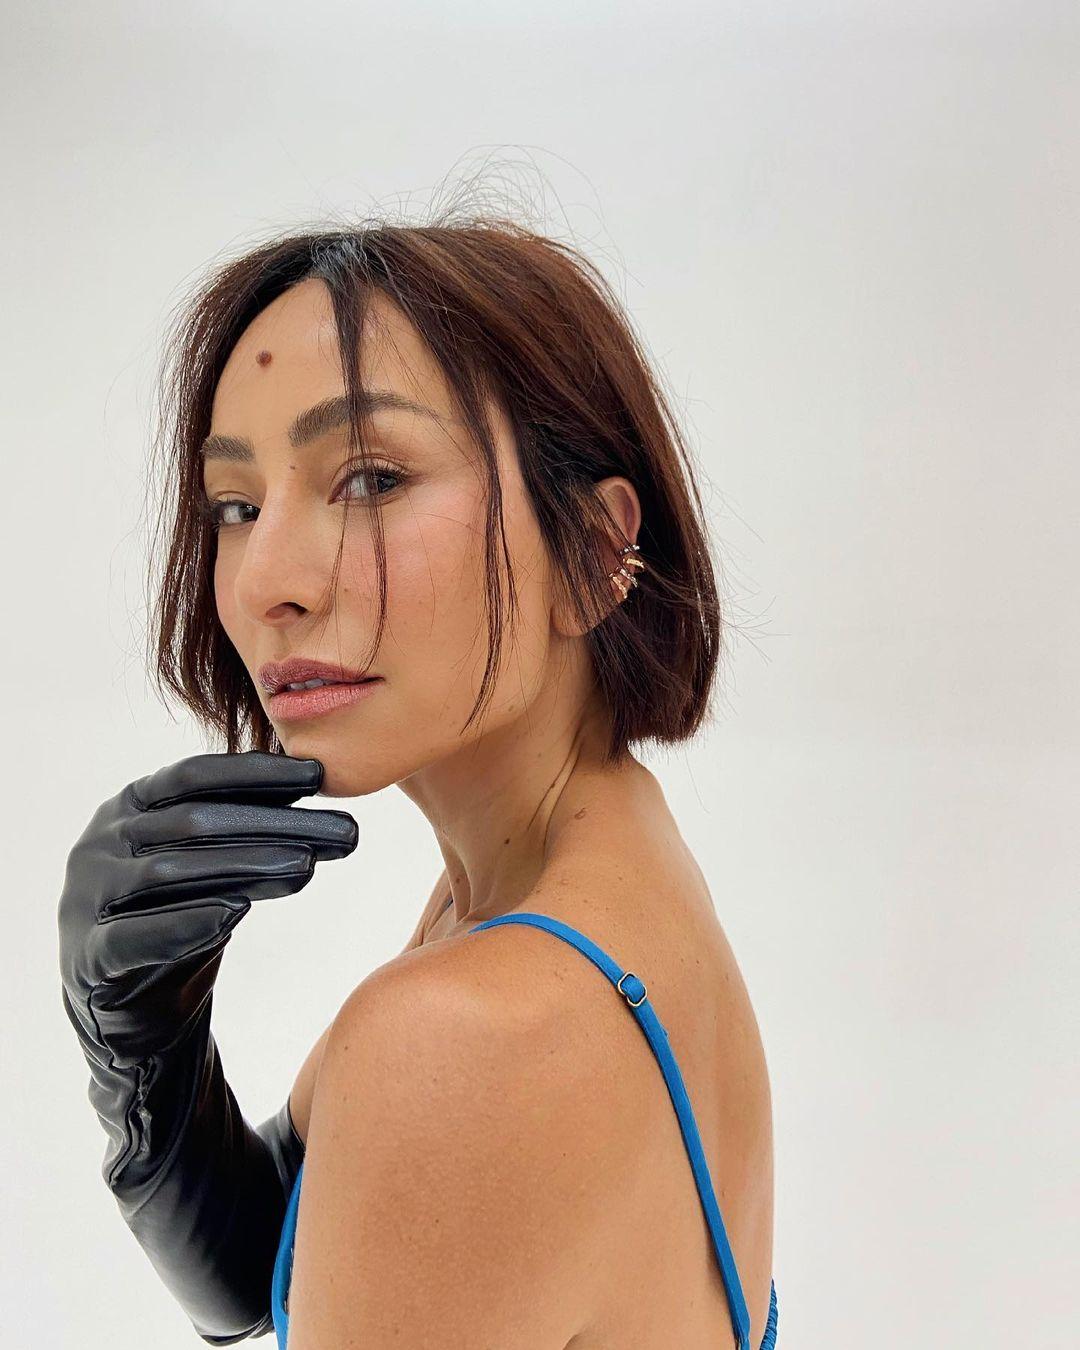 Novo visual de Sabrina Sato - Corte curto.